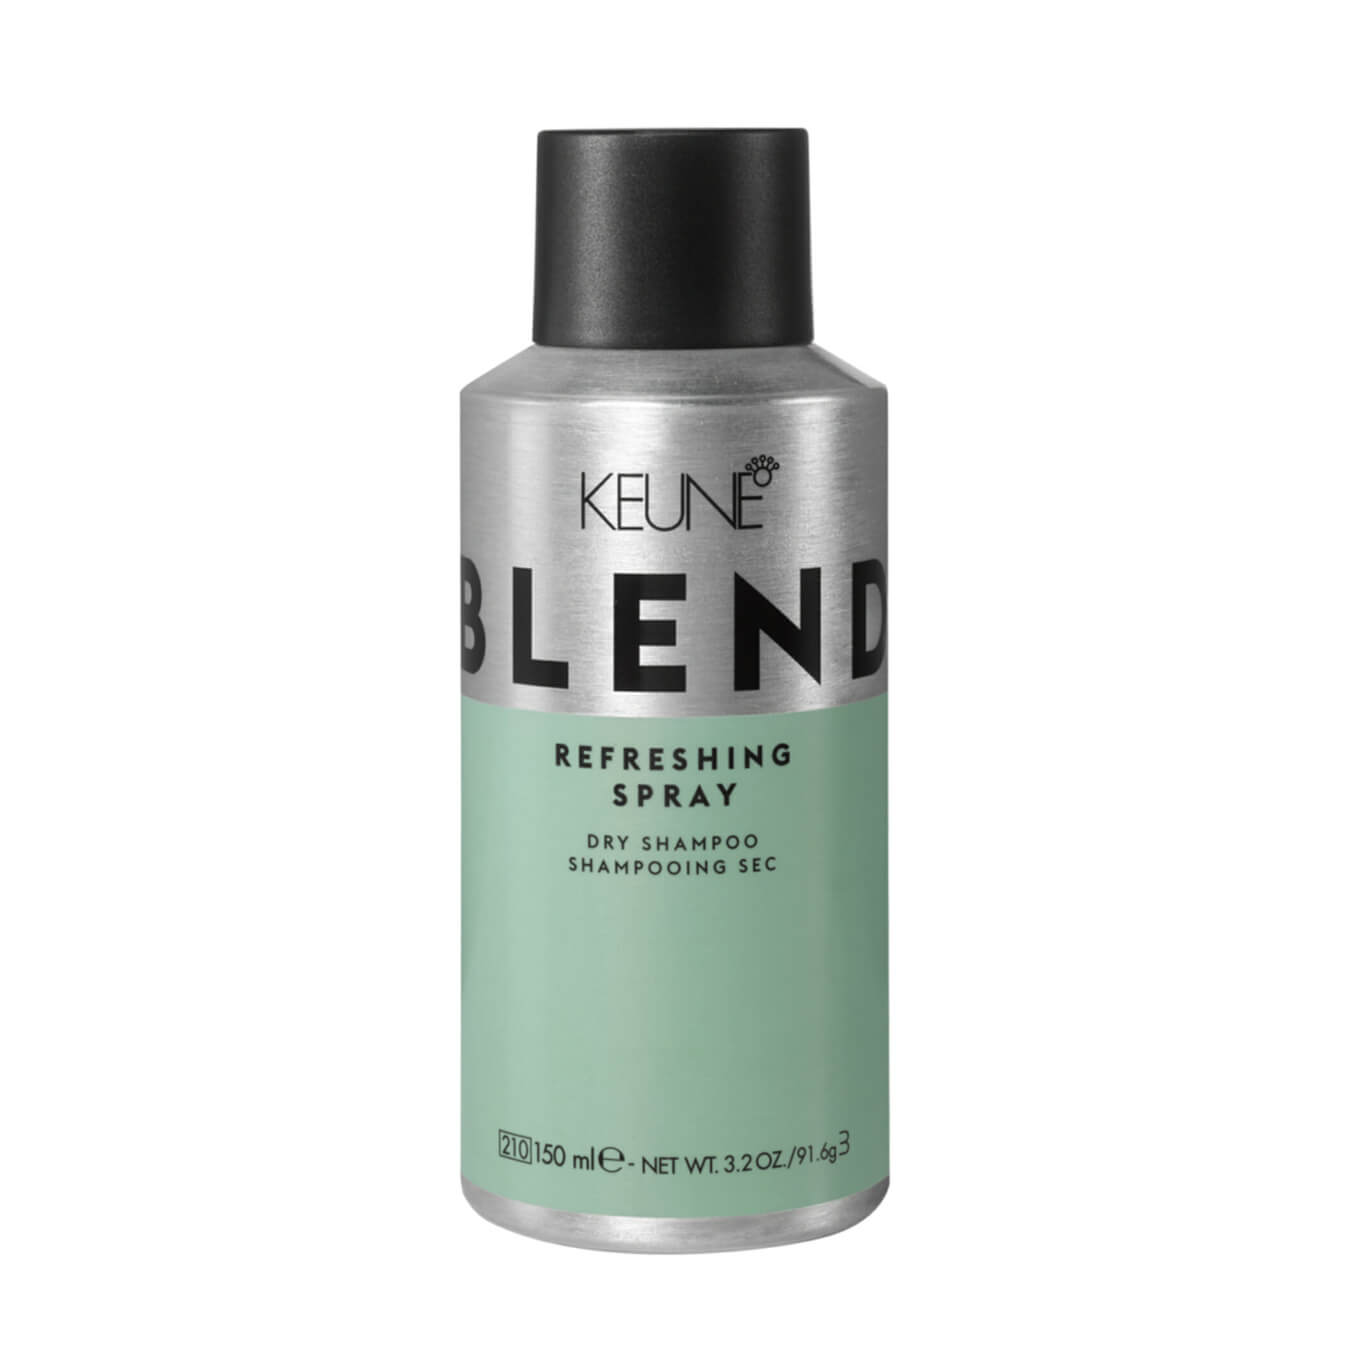 Kauf Keune Blend Refreshing Spray 150ml